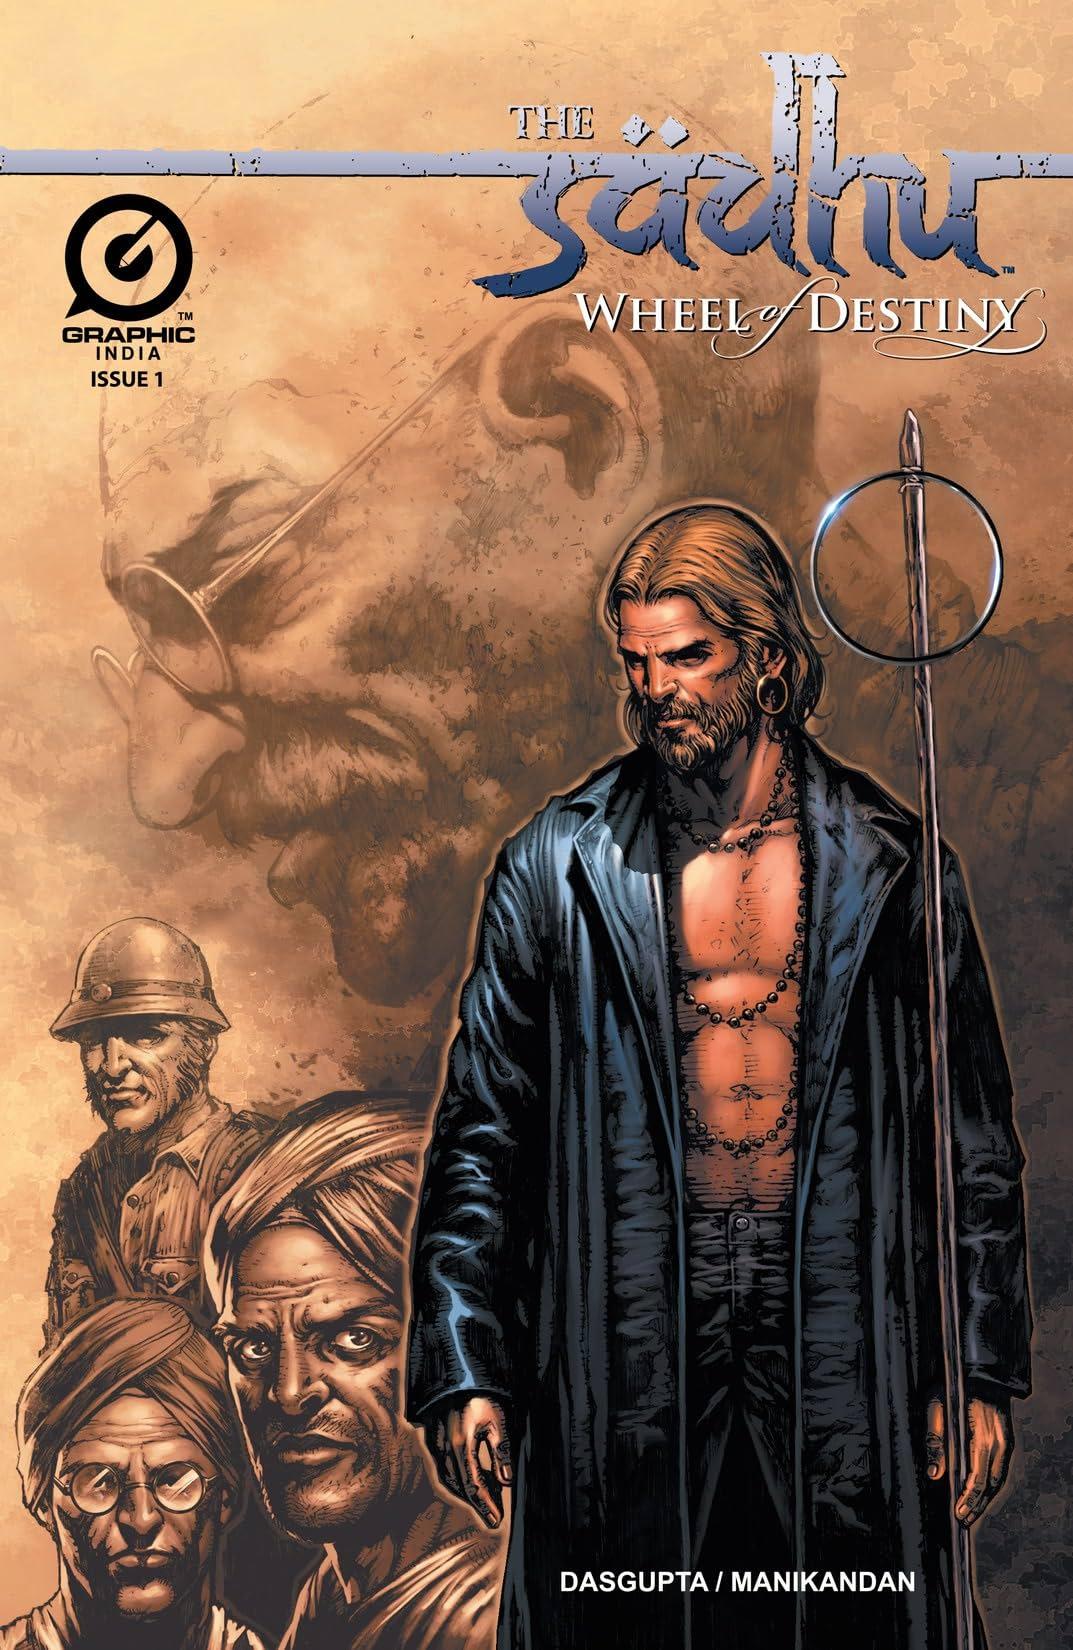 The Sadhu: Wheel of Destiny #1